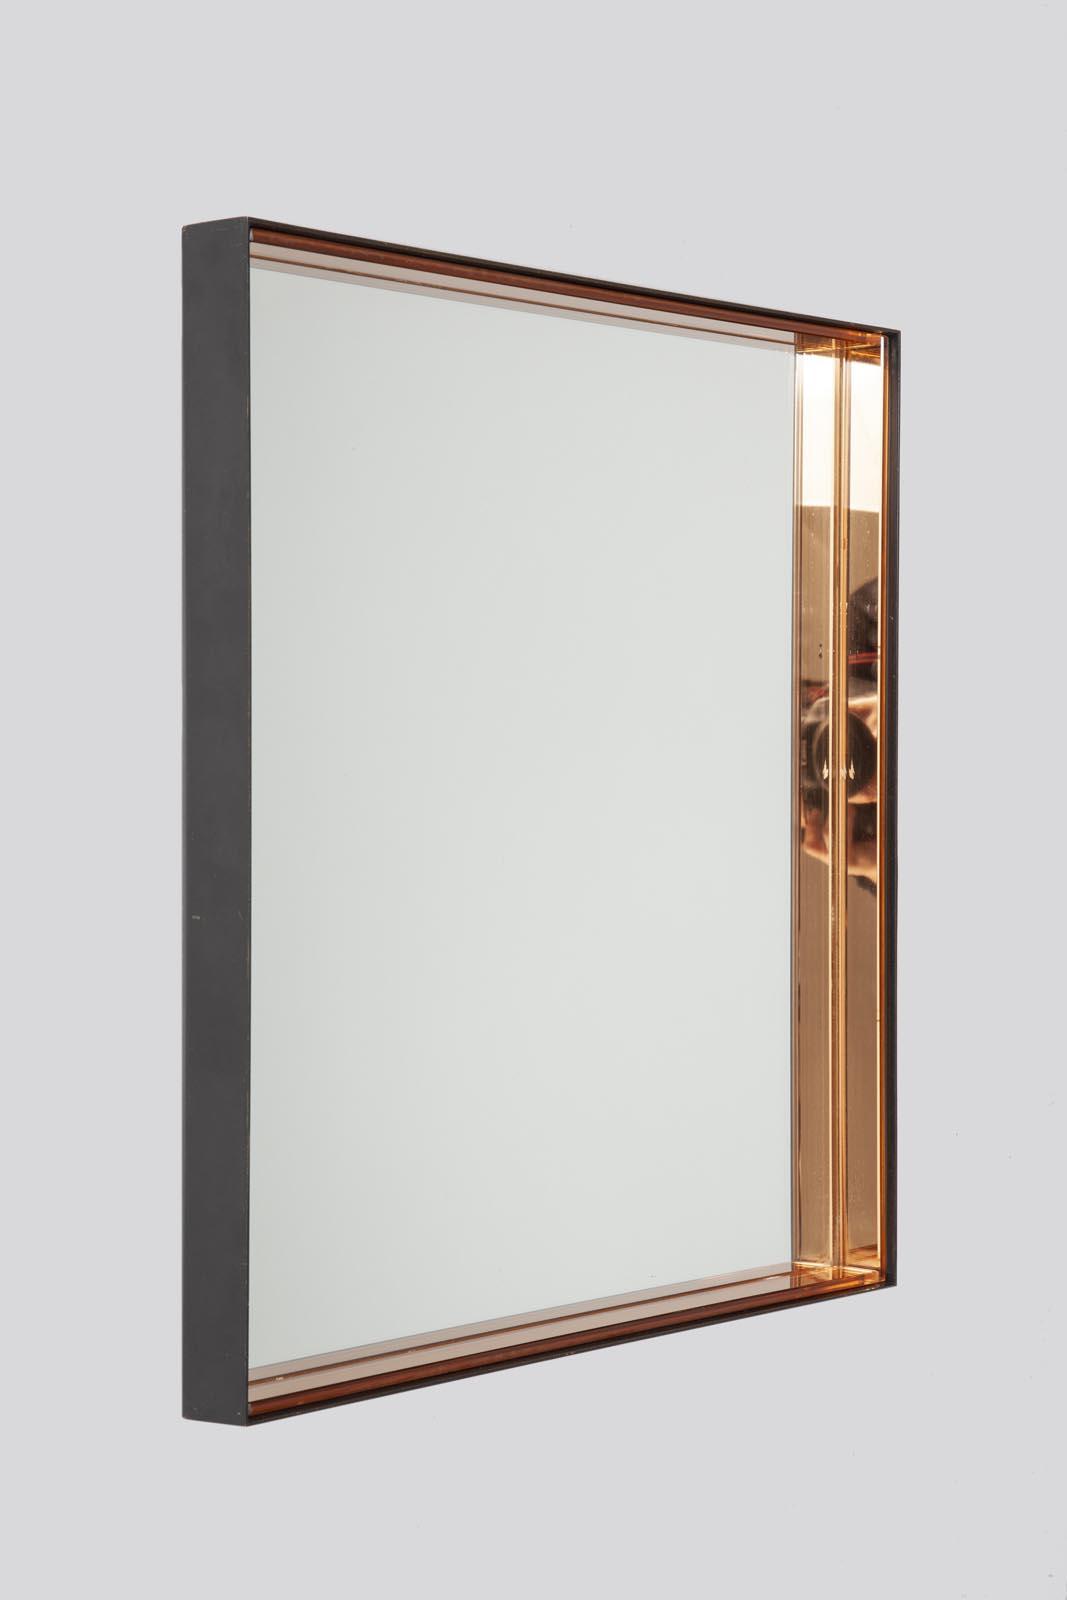 Max Ingrand mirror